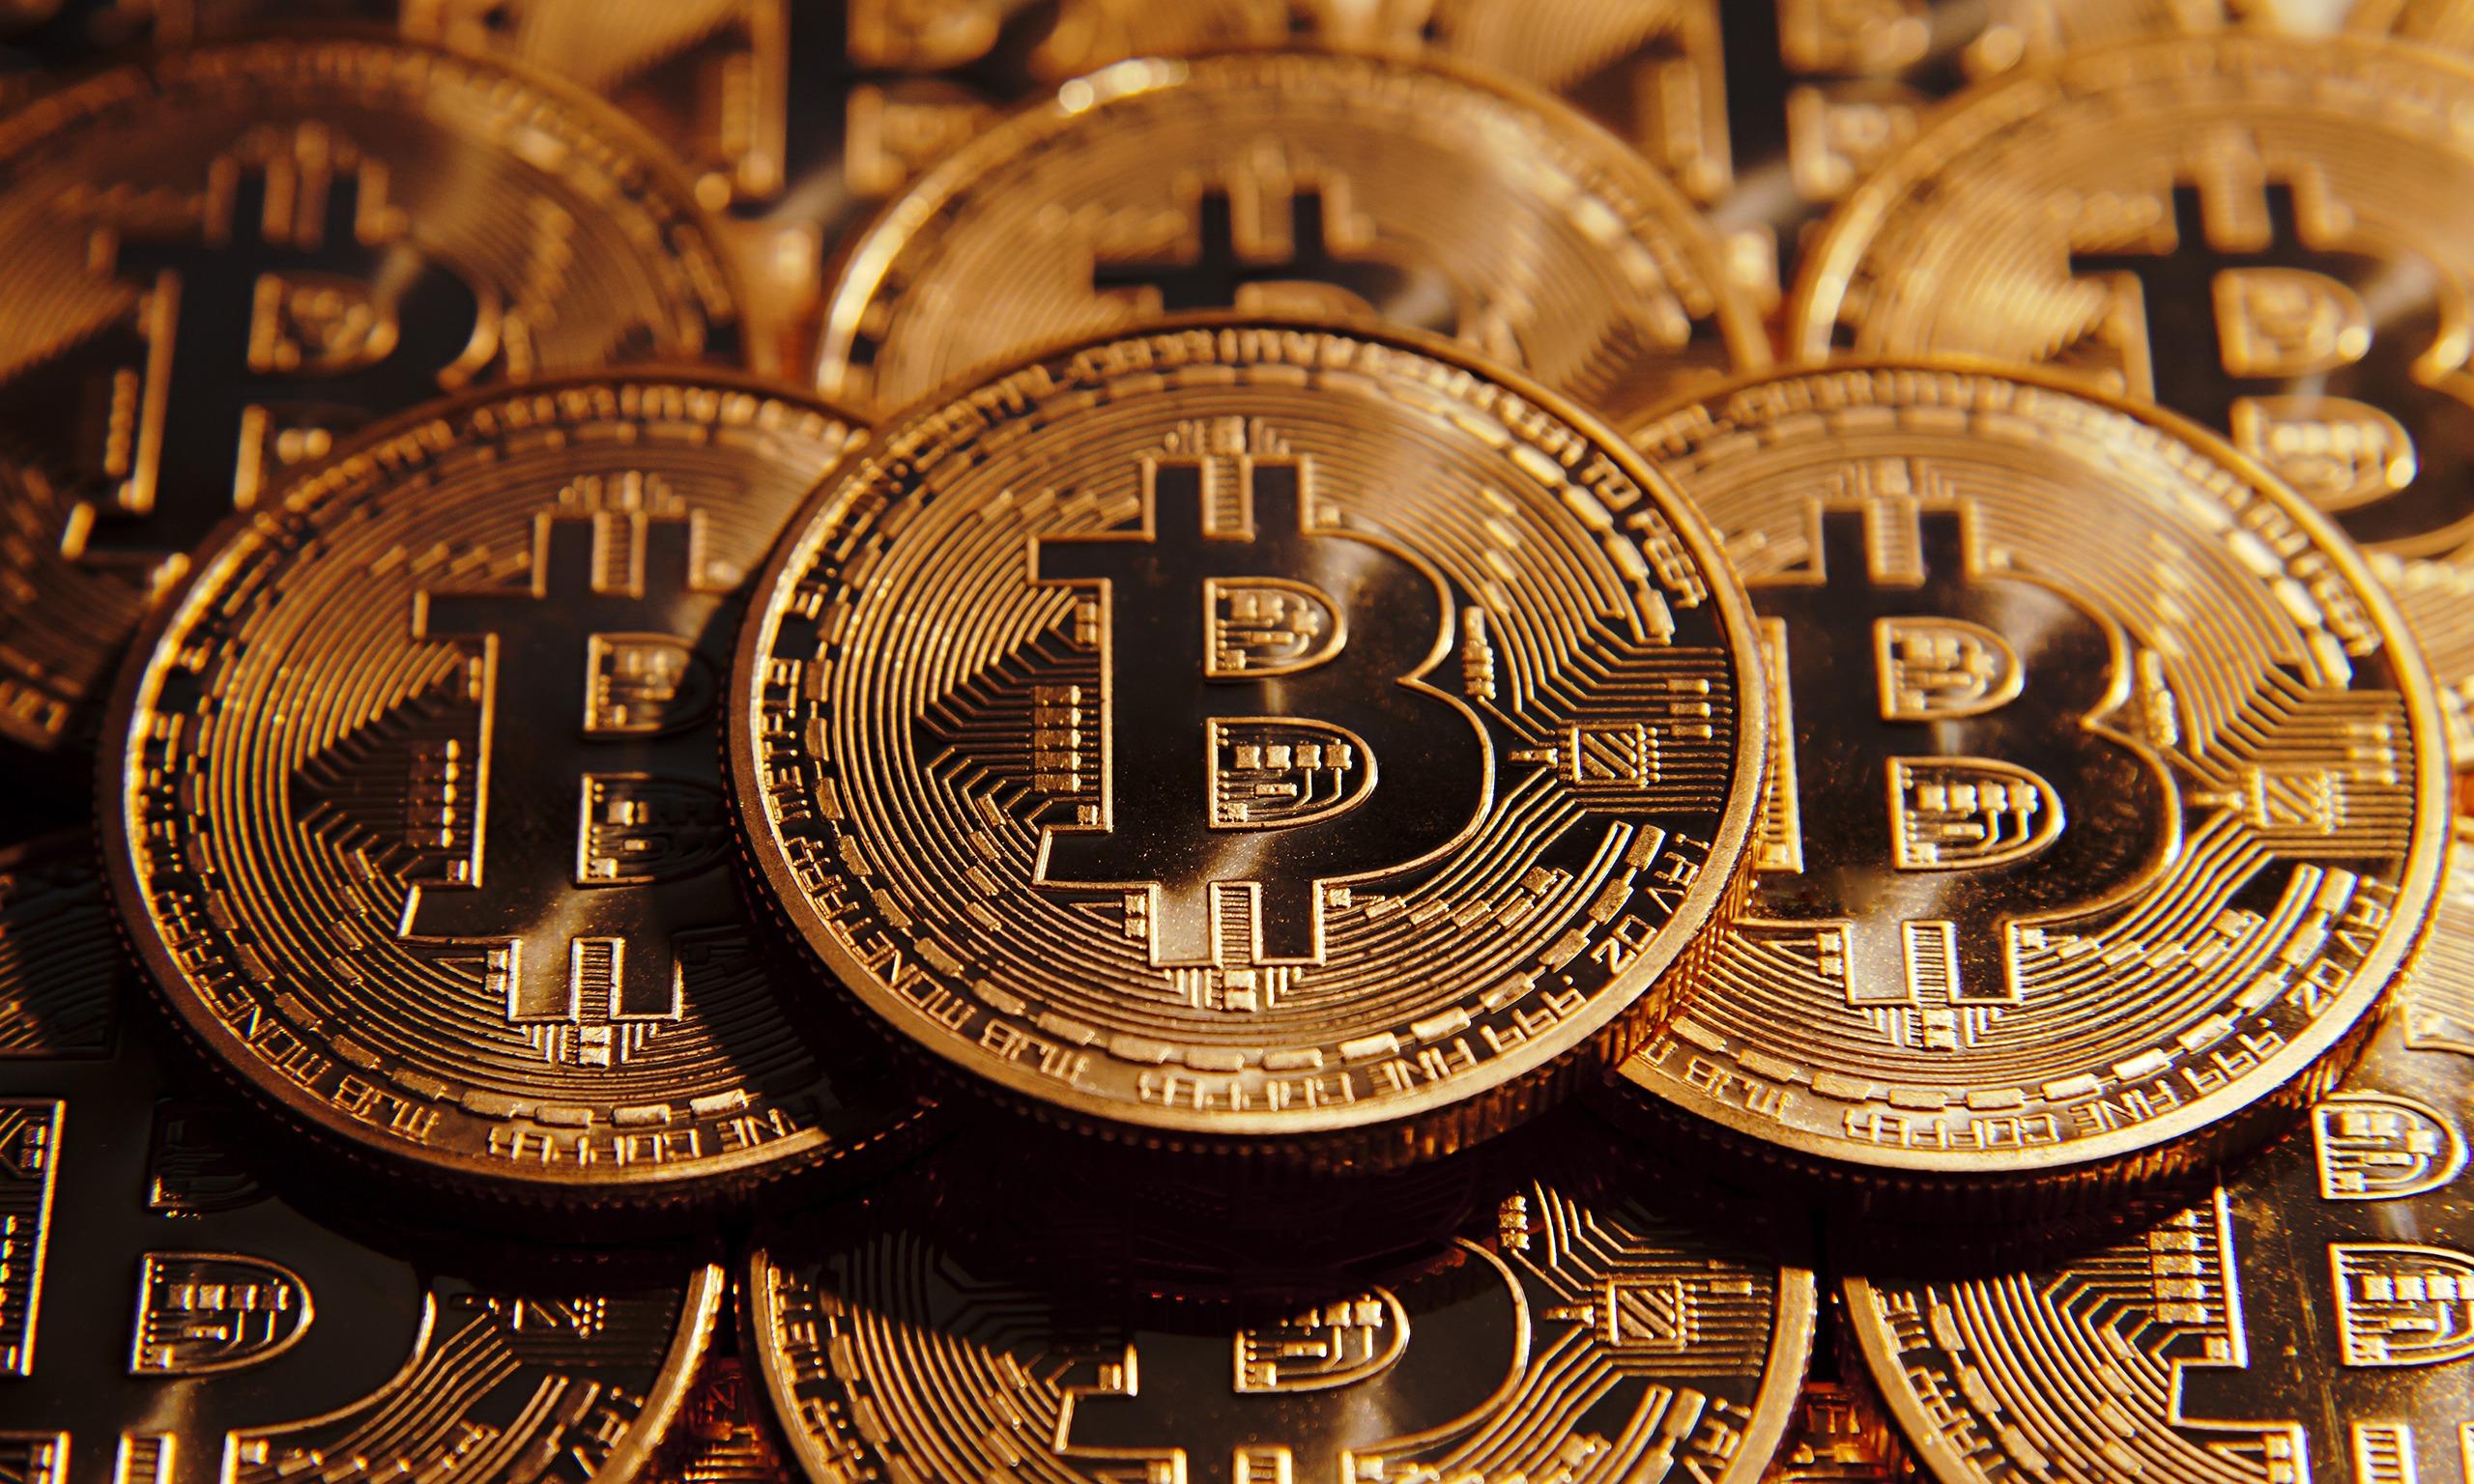 Bitcoin criptovalute futuro moneta